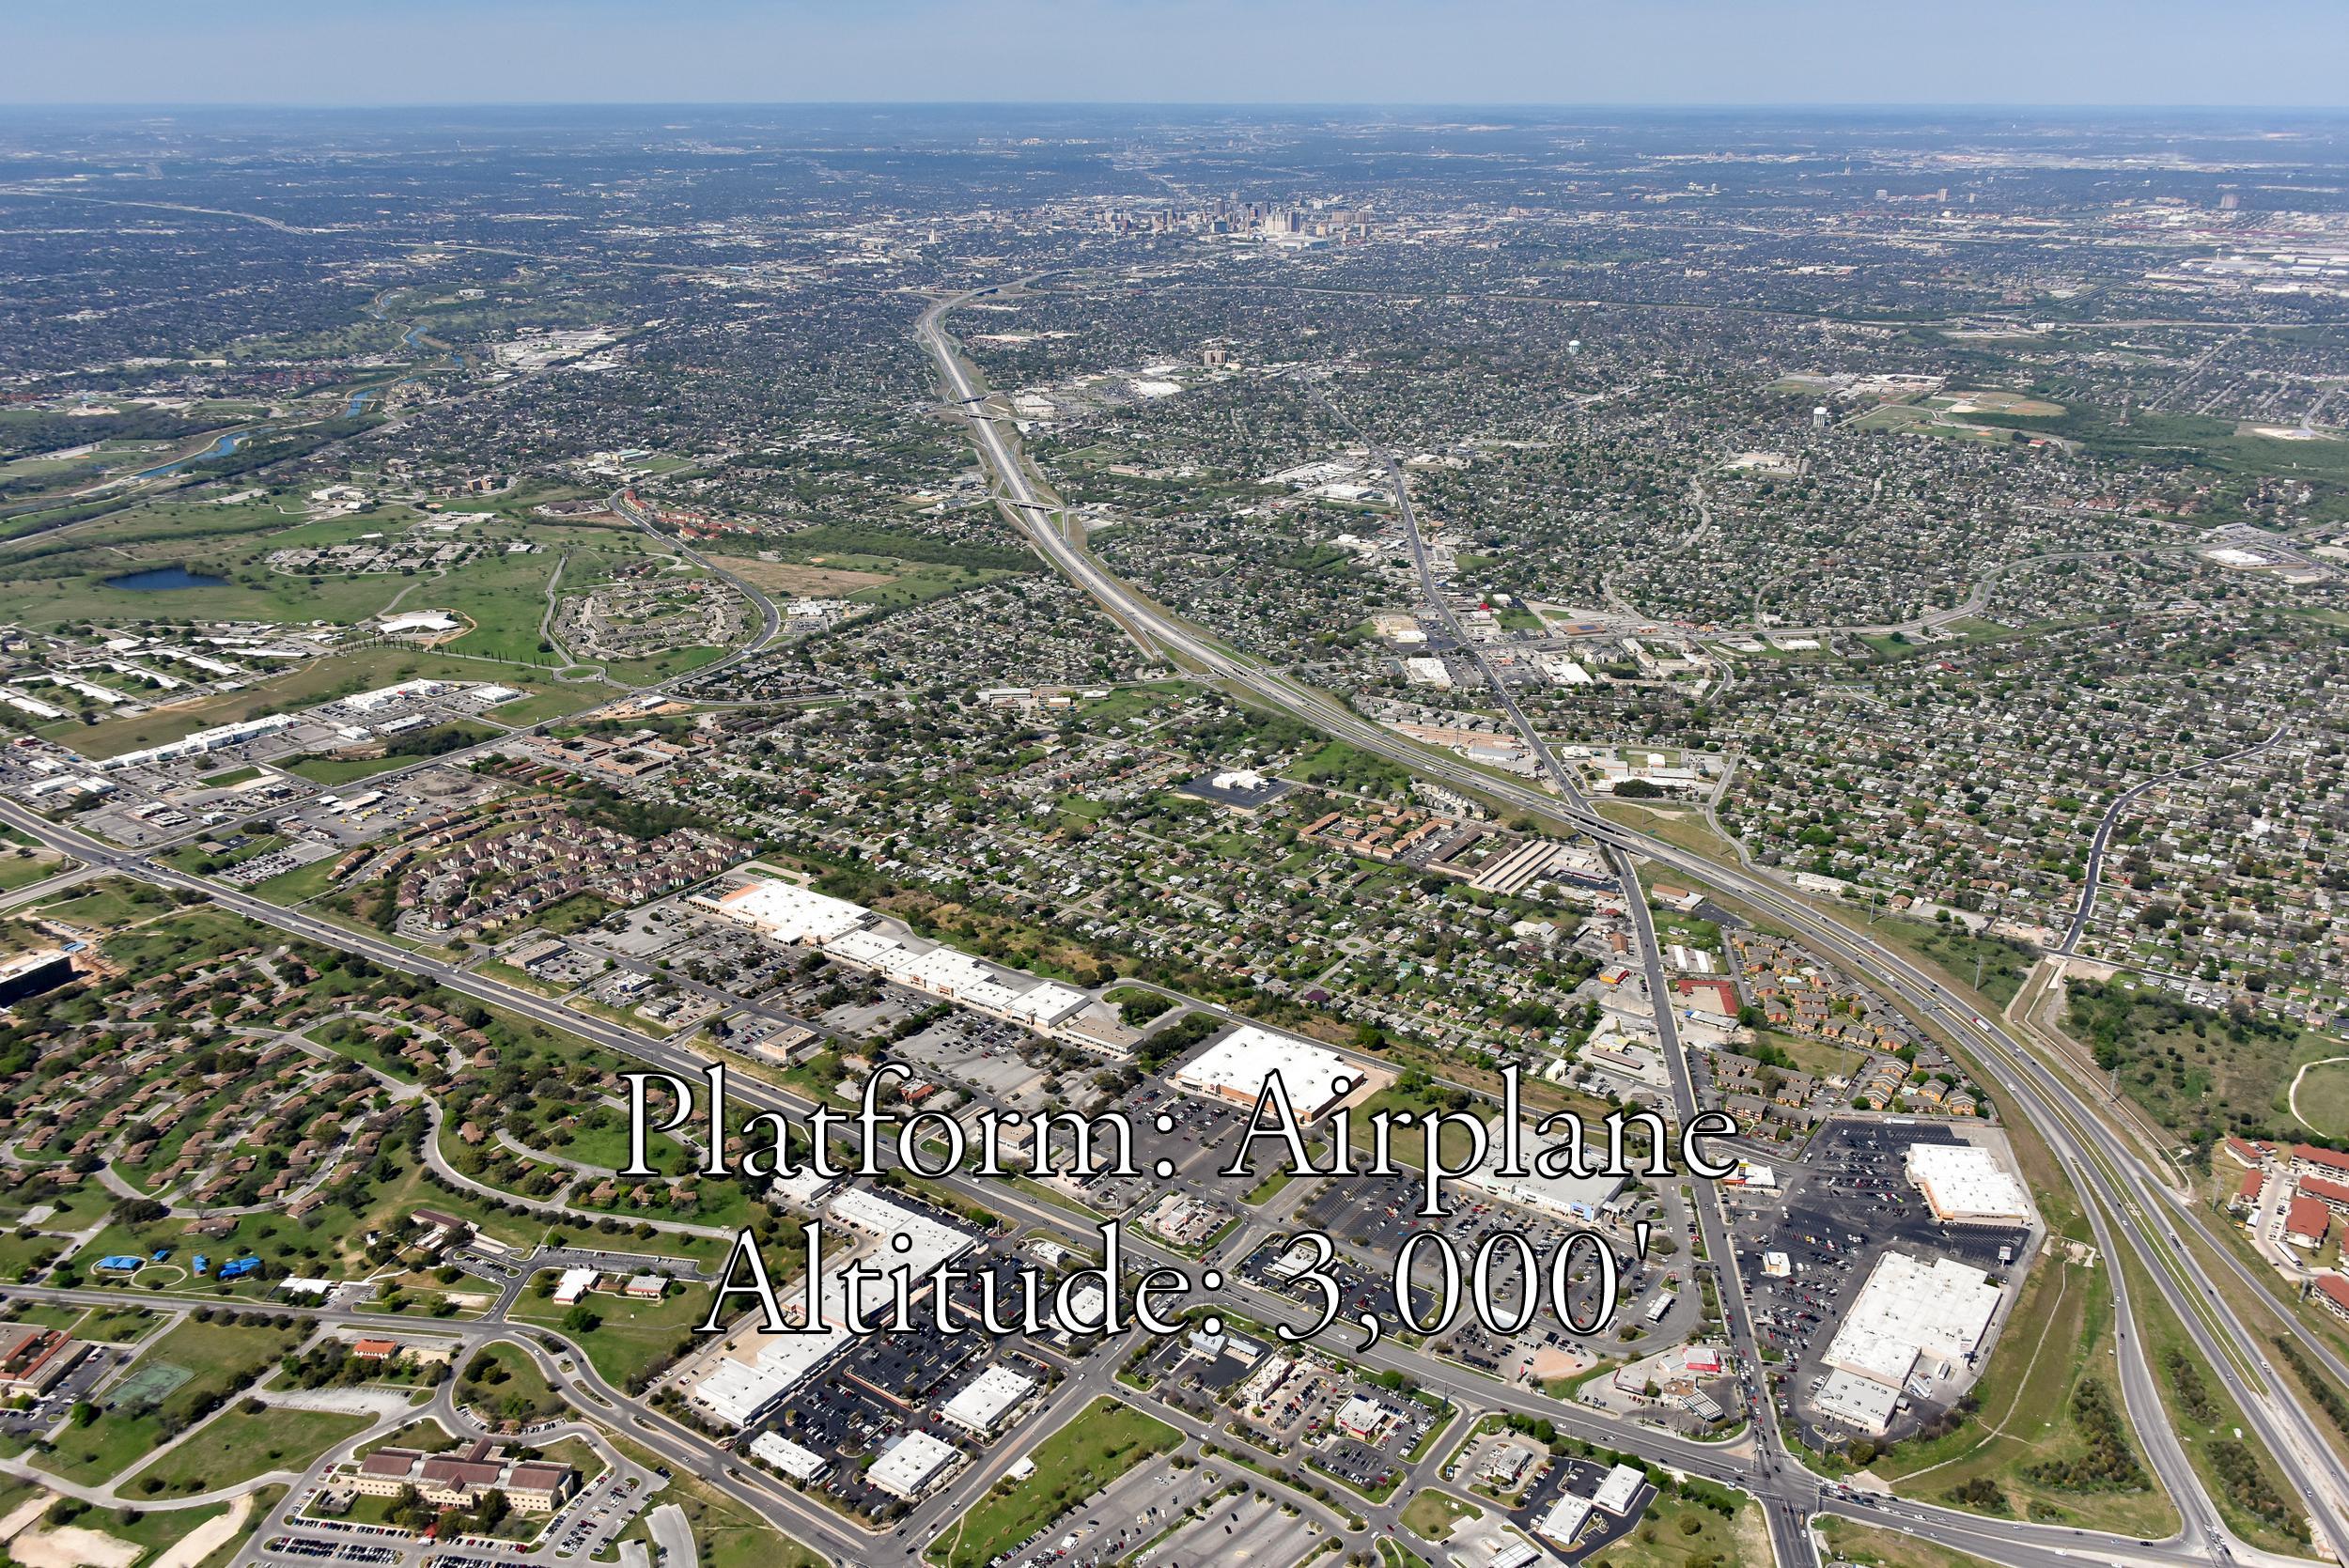 san-antonio-texas-aerial-photographer-drone-photo-image-tx-airplane-3000